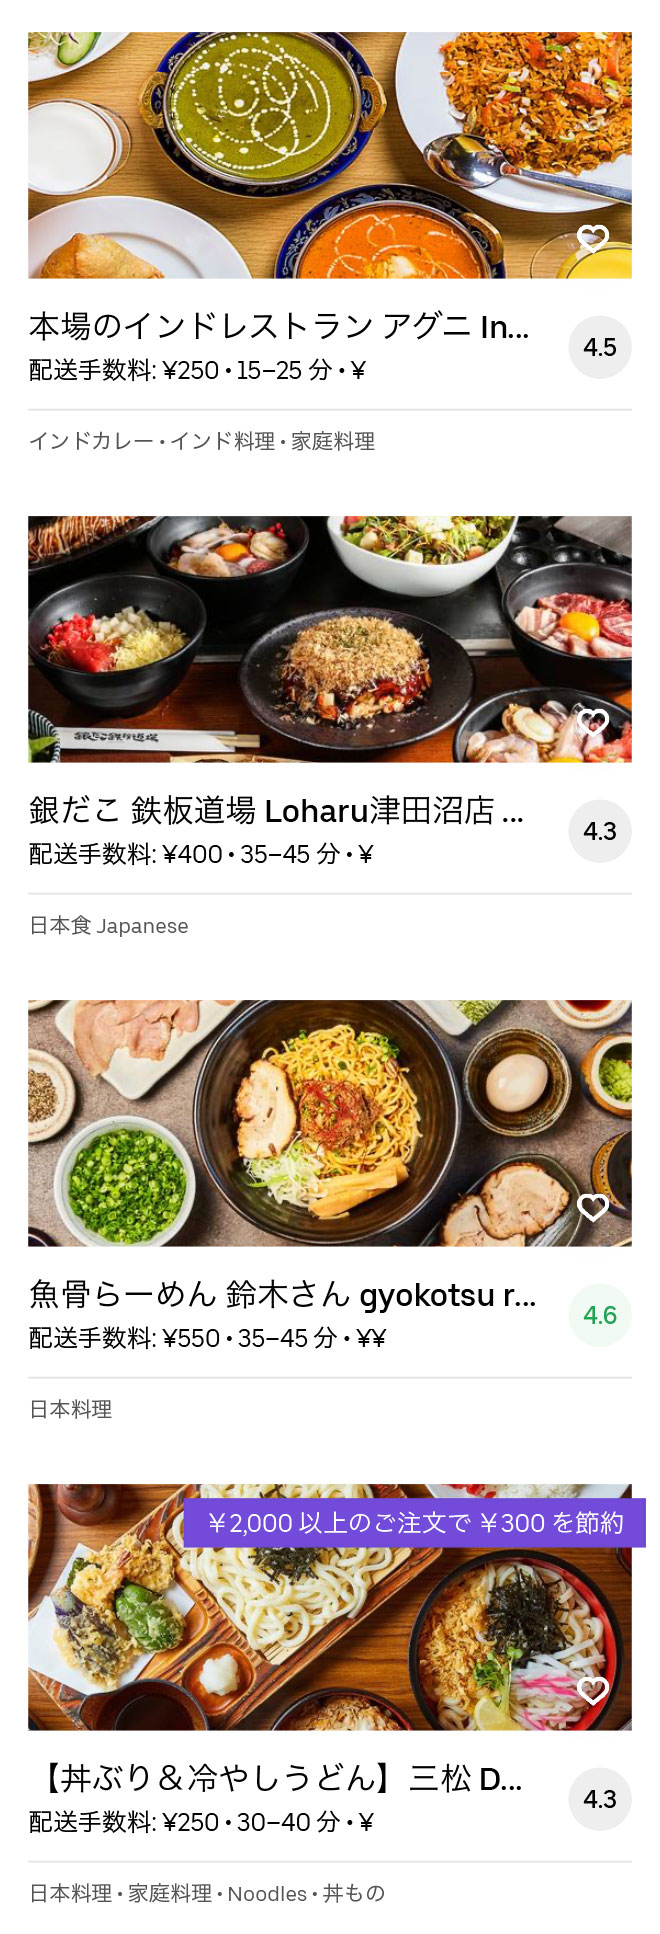 Funabashi menu 2004 09